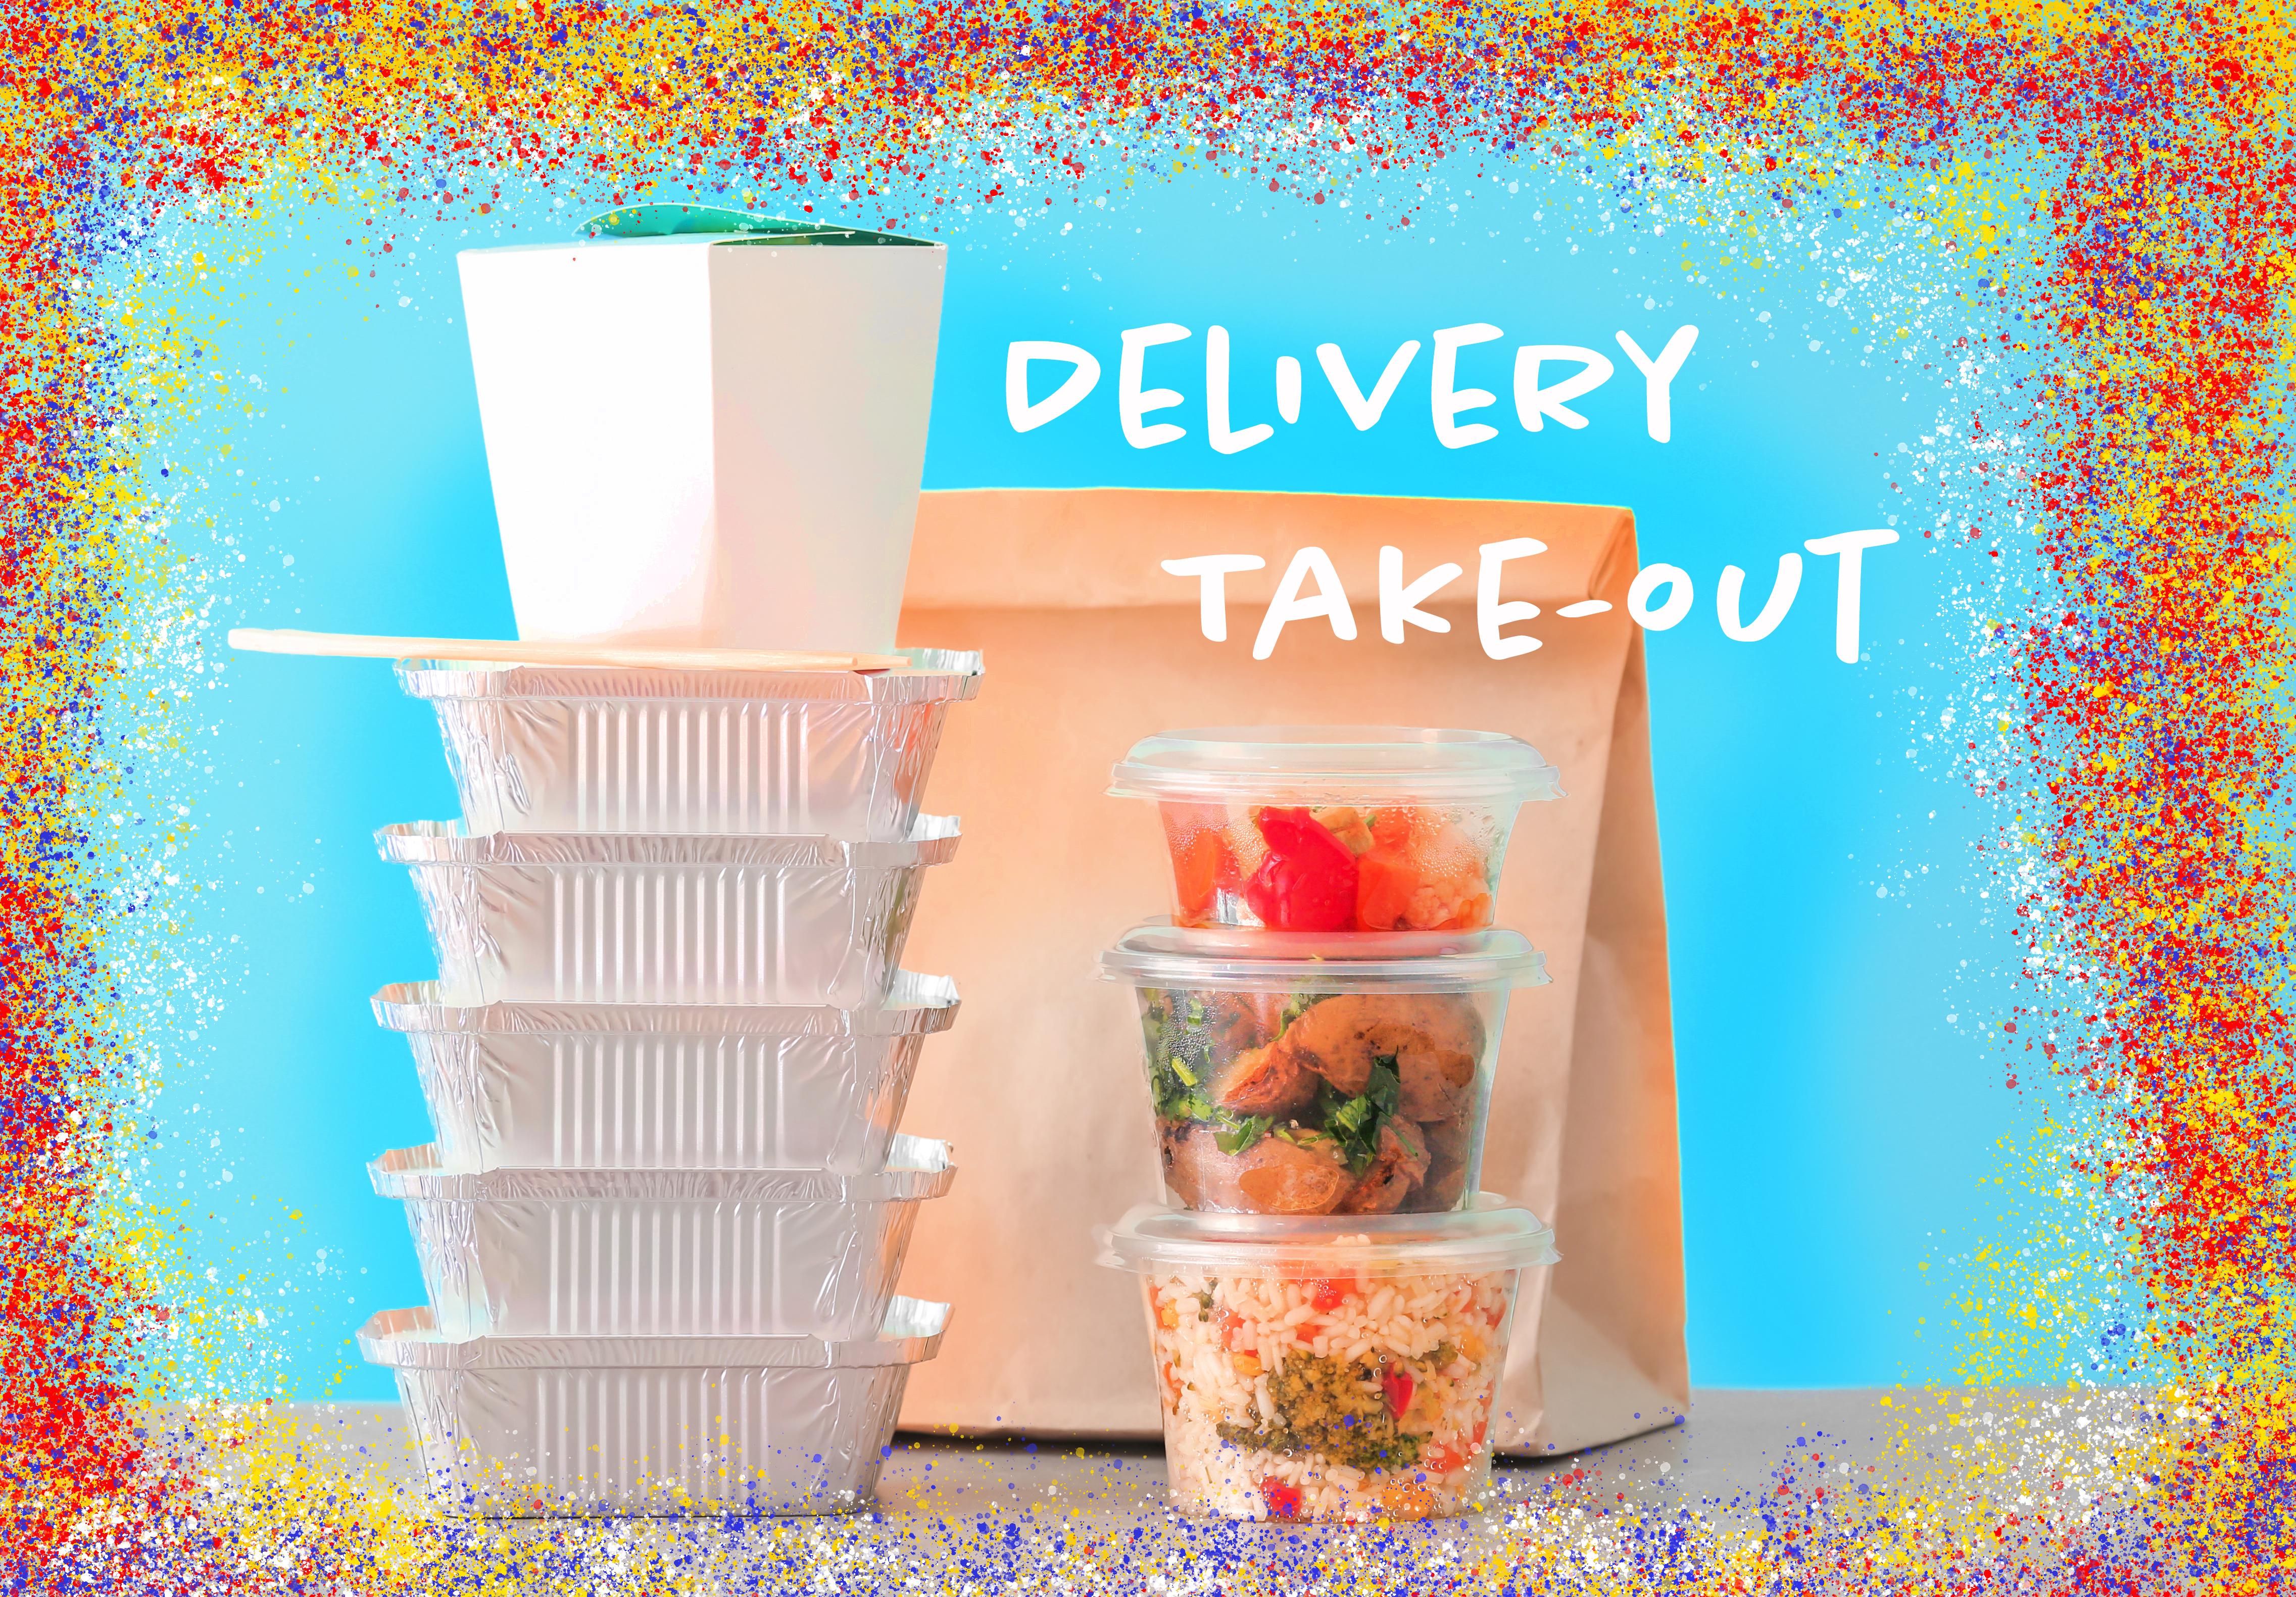 Apoyo a restaurantes latinos locales que ofrecen entrega o servicio para llevar